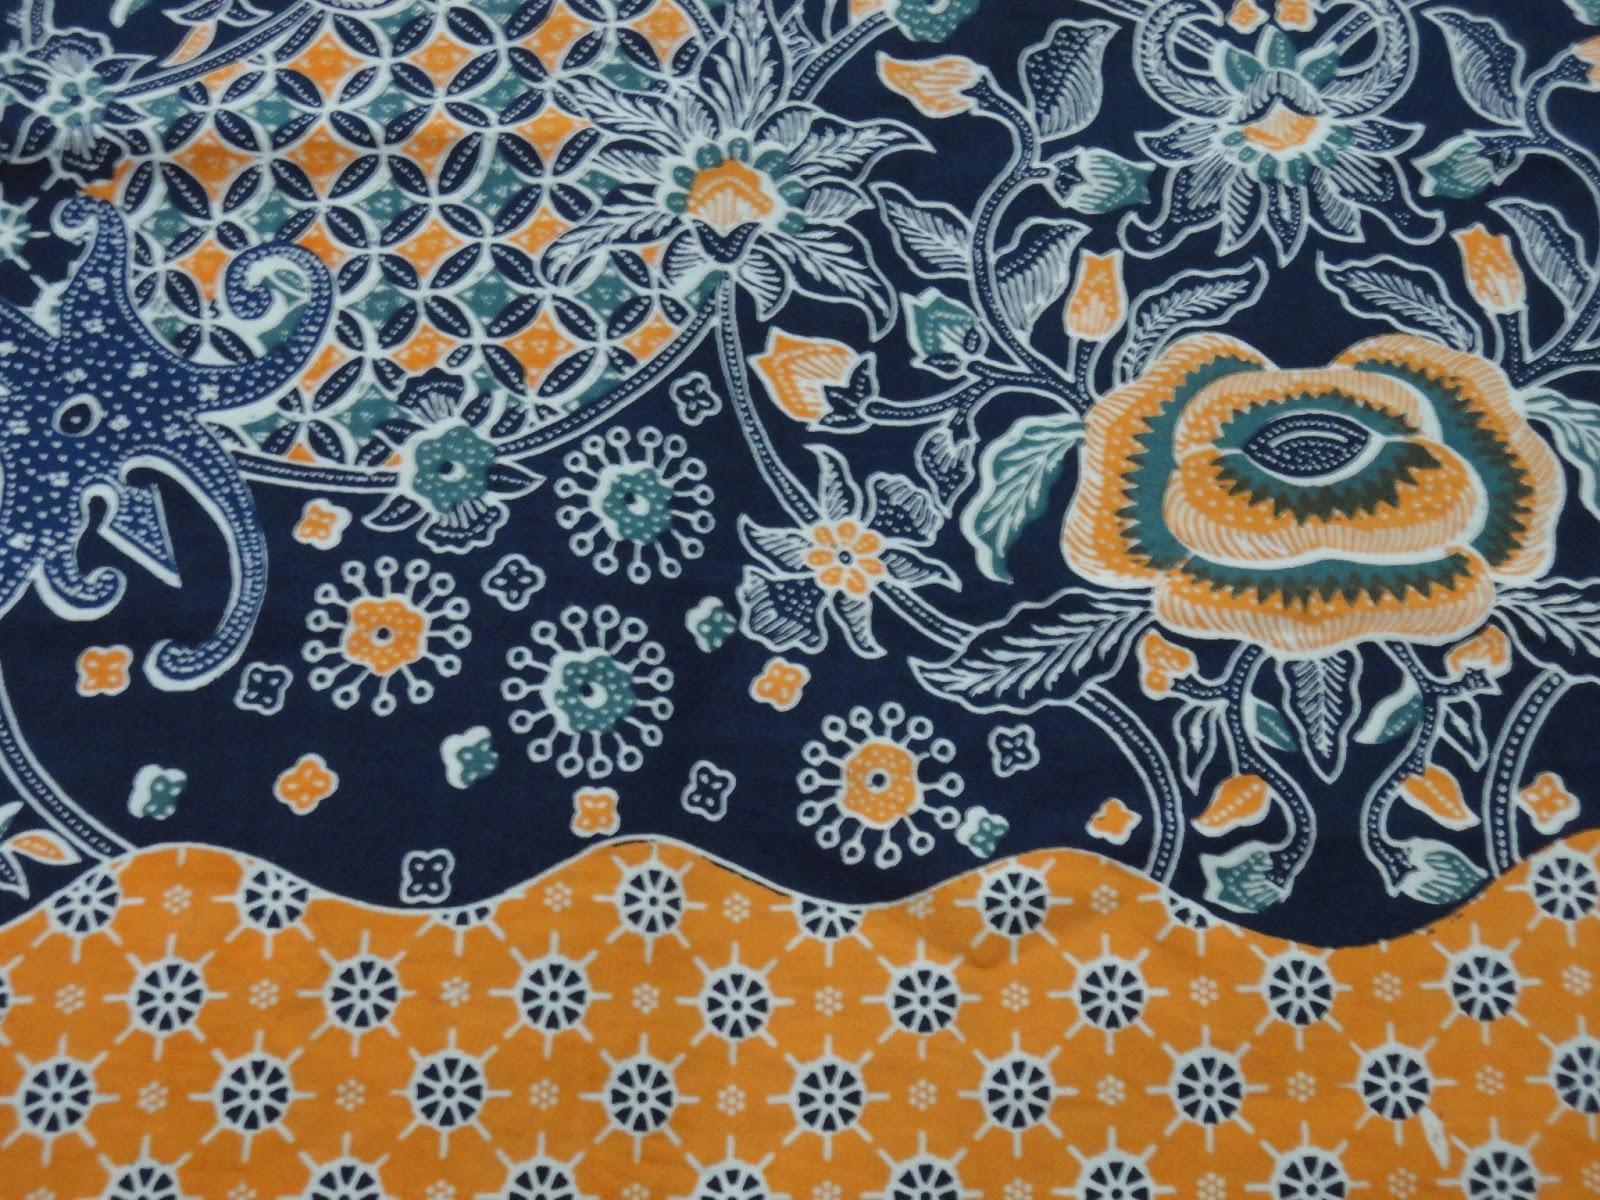 Baju kahwin muslimah www imgarcade com online image arcade - Dwp Djbc Batik Sekar Jagad Dwp Djbc Wallpaper